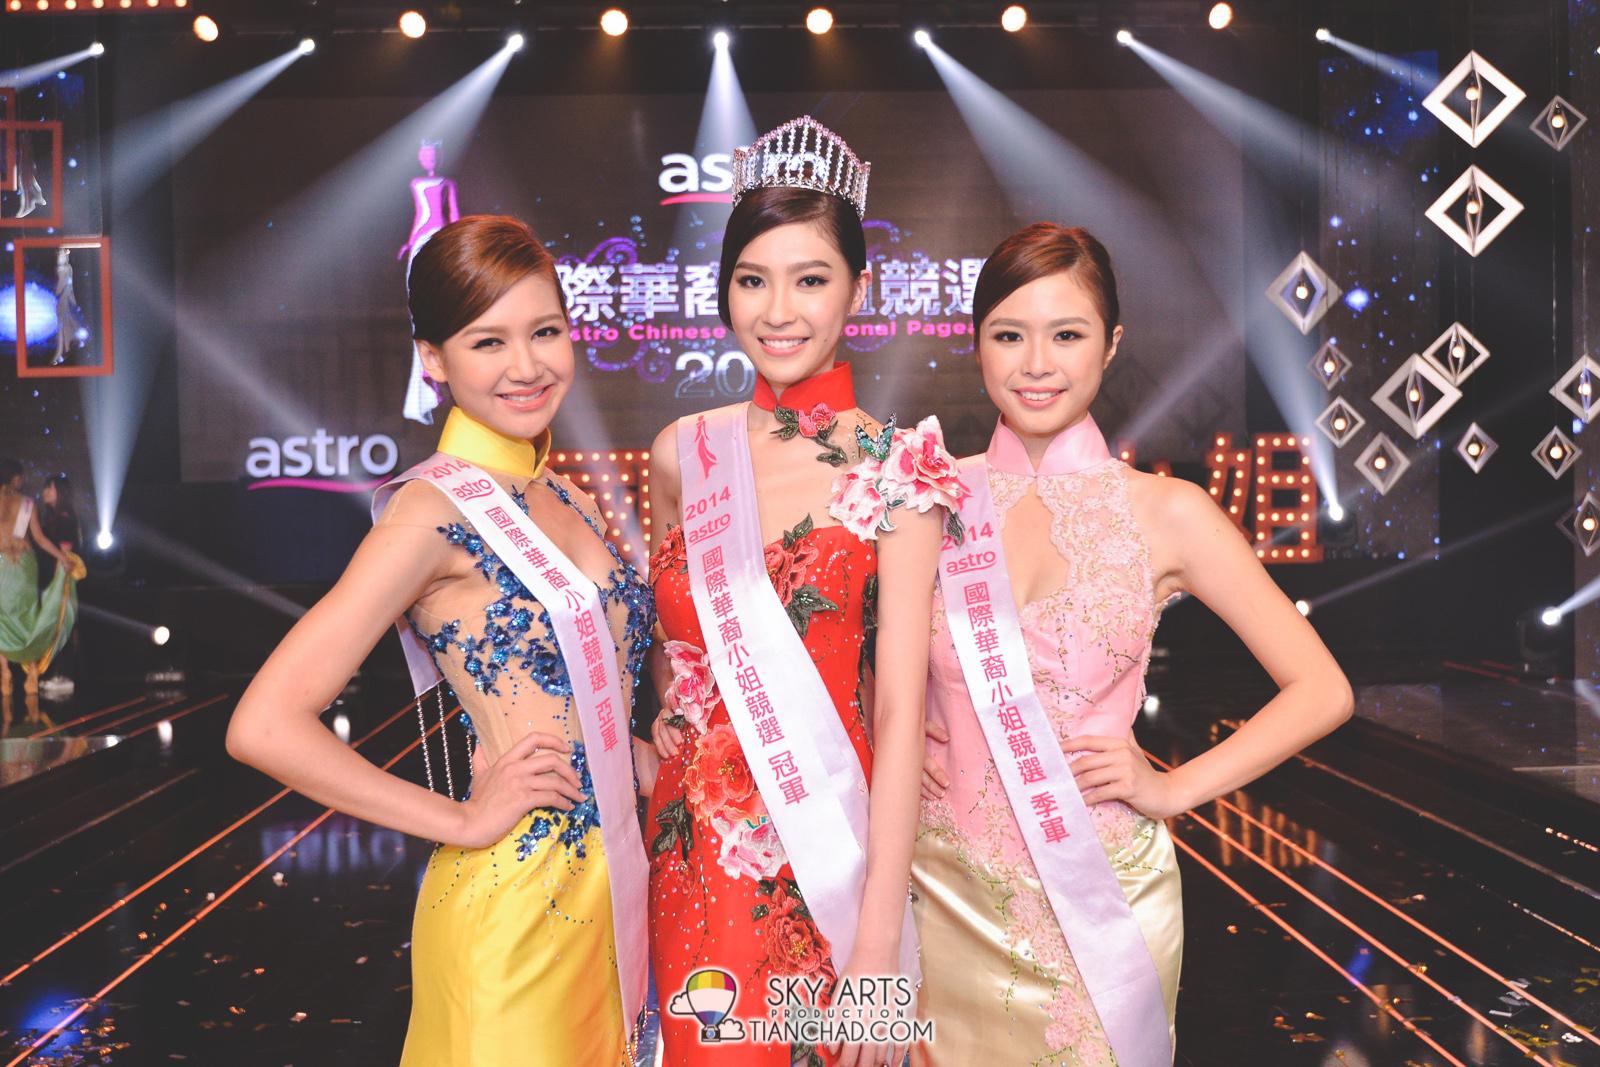 Astro国际华裔小姐竞选2014 - 亚军Trisha郭秀文, 冠军Anjoe许愫恩与季军Grace钟欣燕